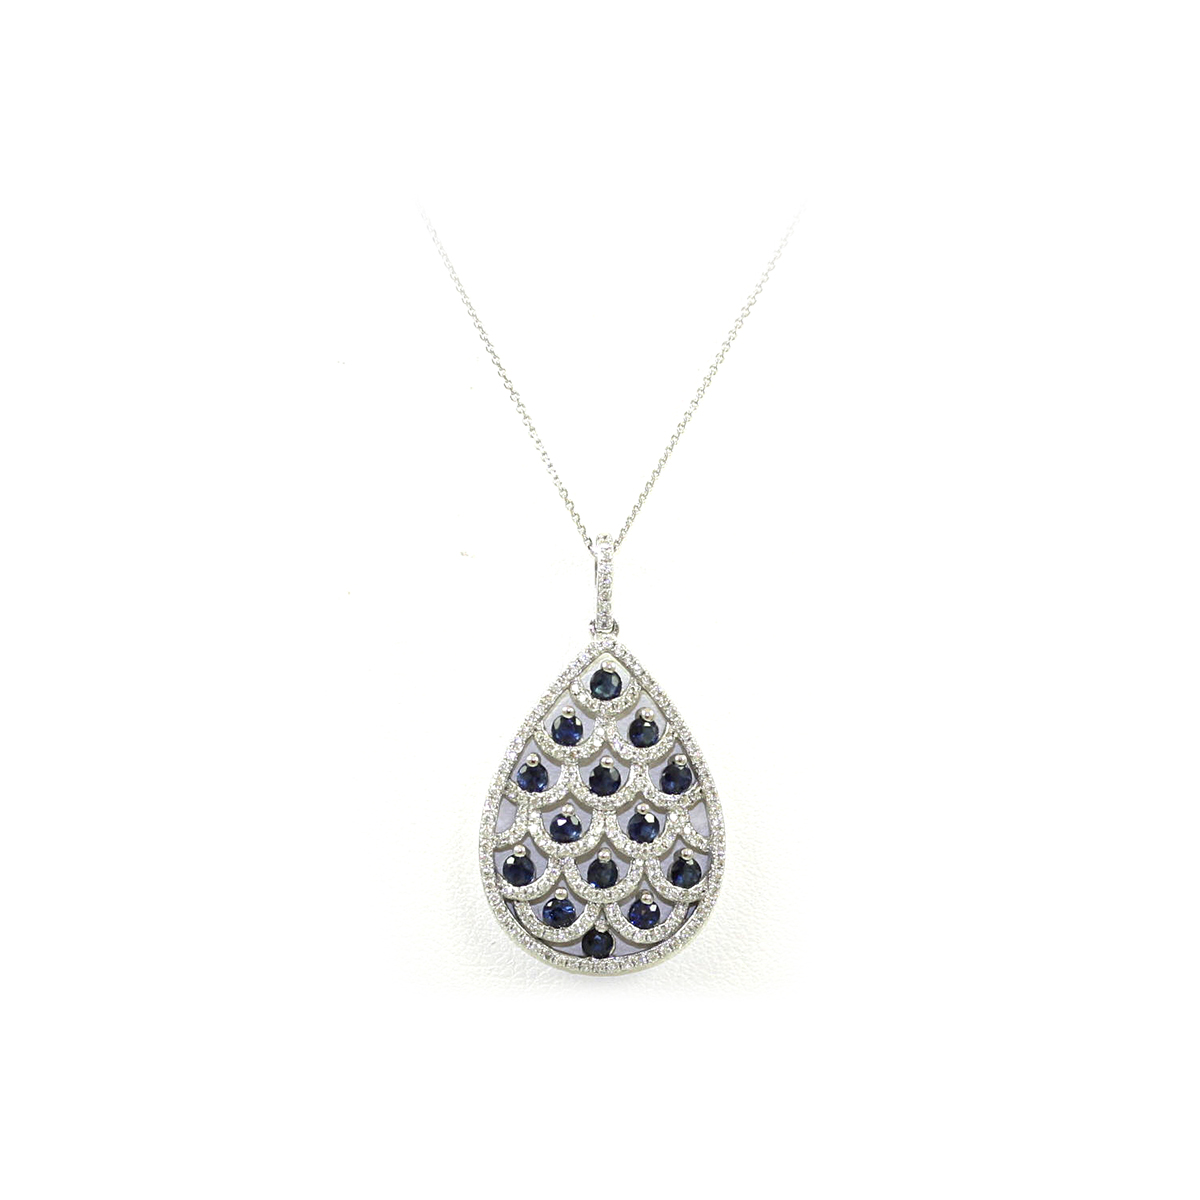 14 Karat White Gold Sapphire and Diamond Teardrop Shaped Pendant Necklace